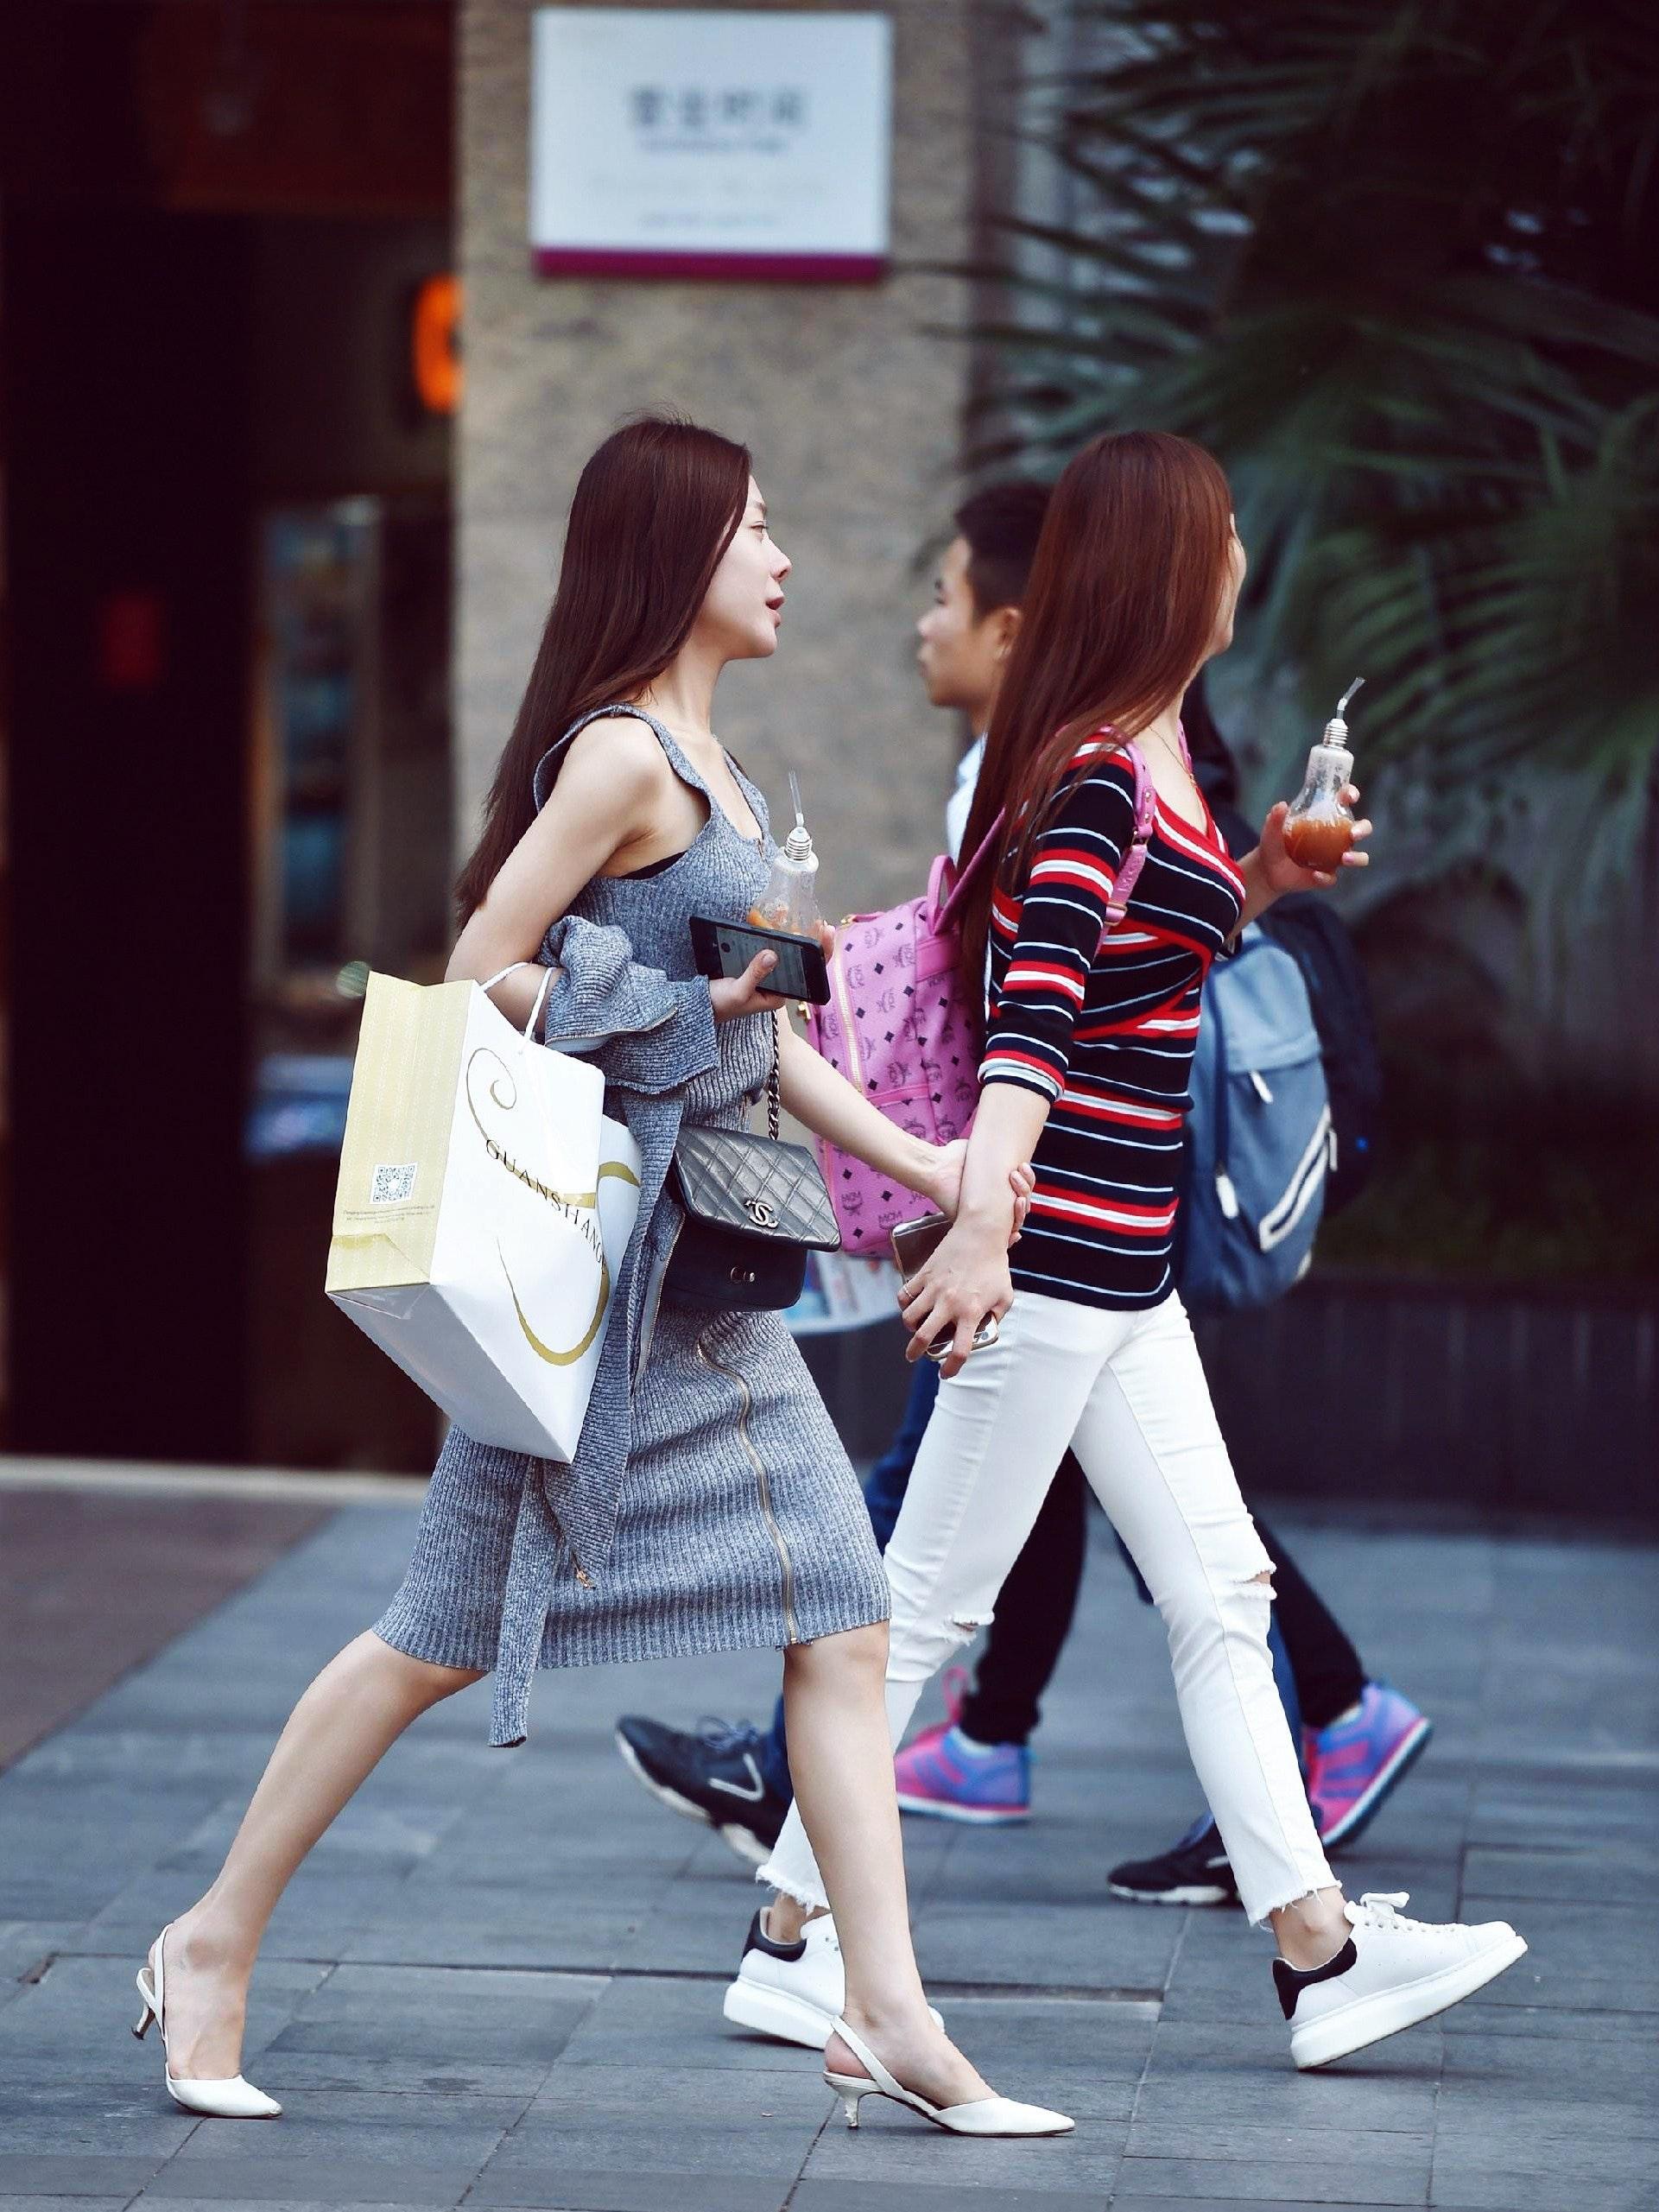 Image of women walking in Beijing